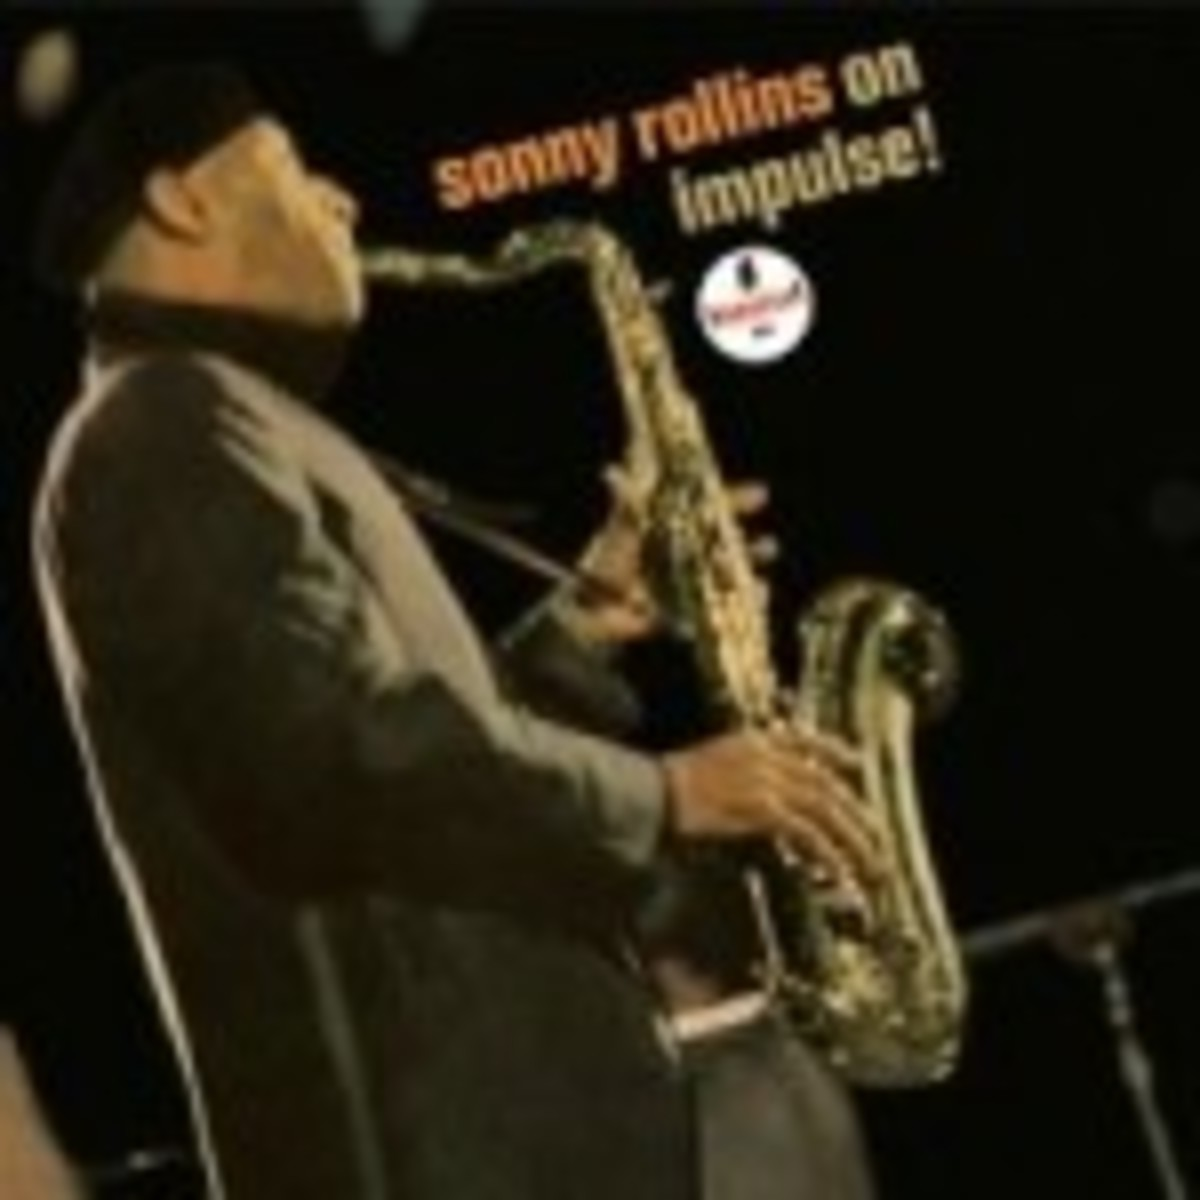 Sonny Rollins_On Impulse!